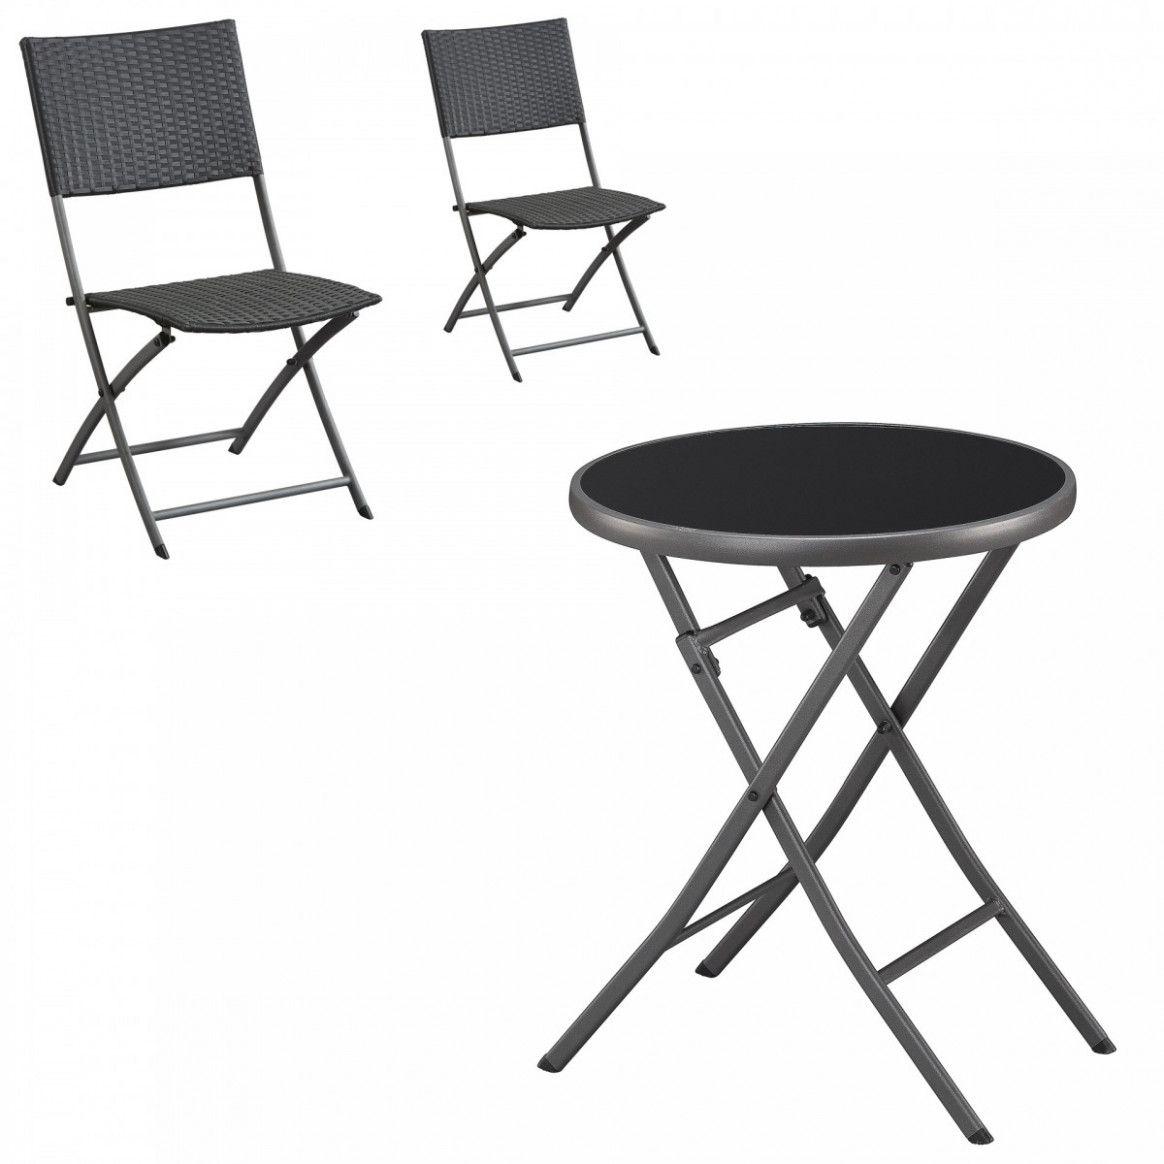 Jysk Salon De With Images Folding Chair Chair Home Decor